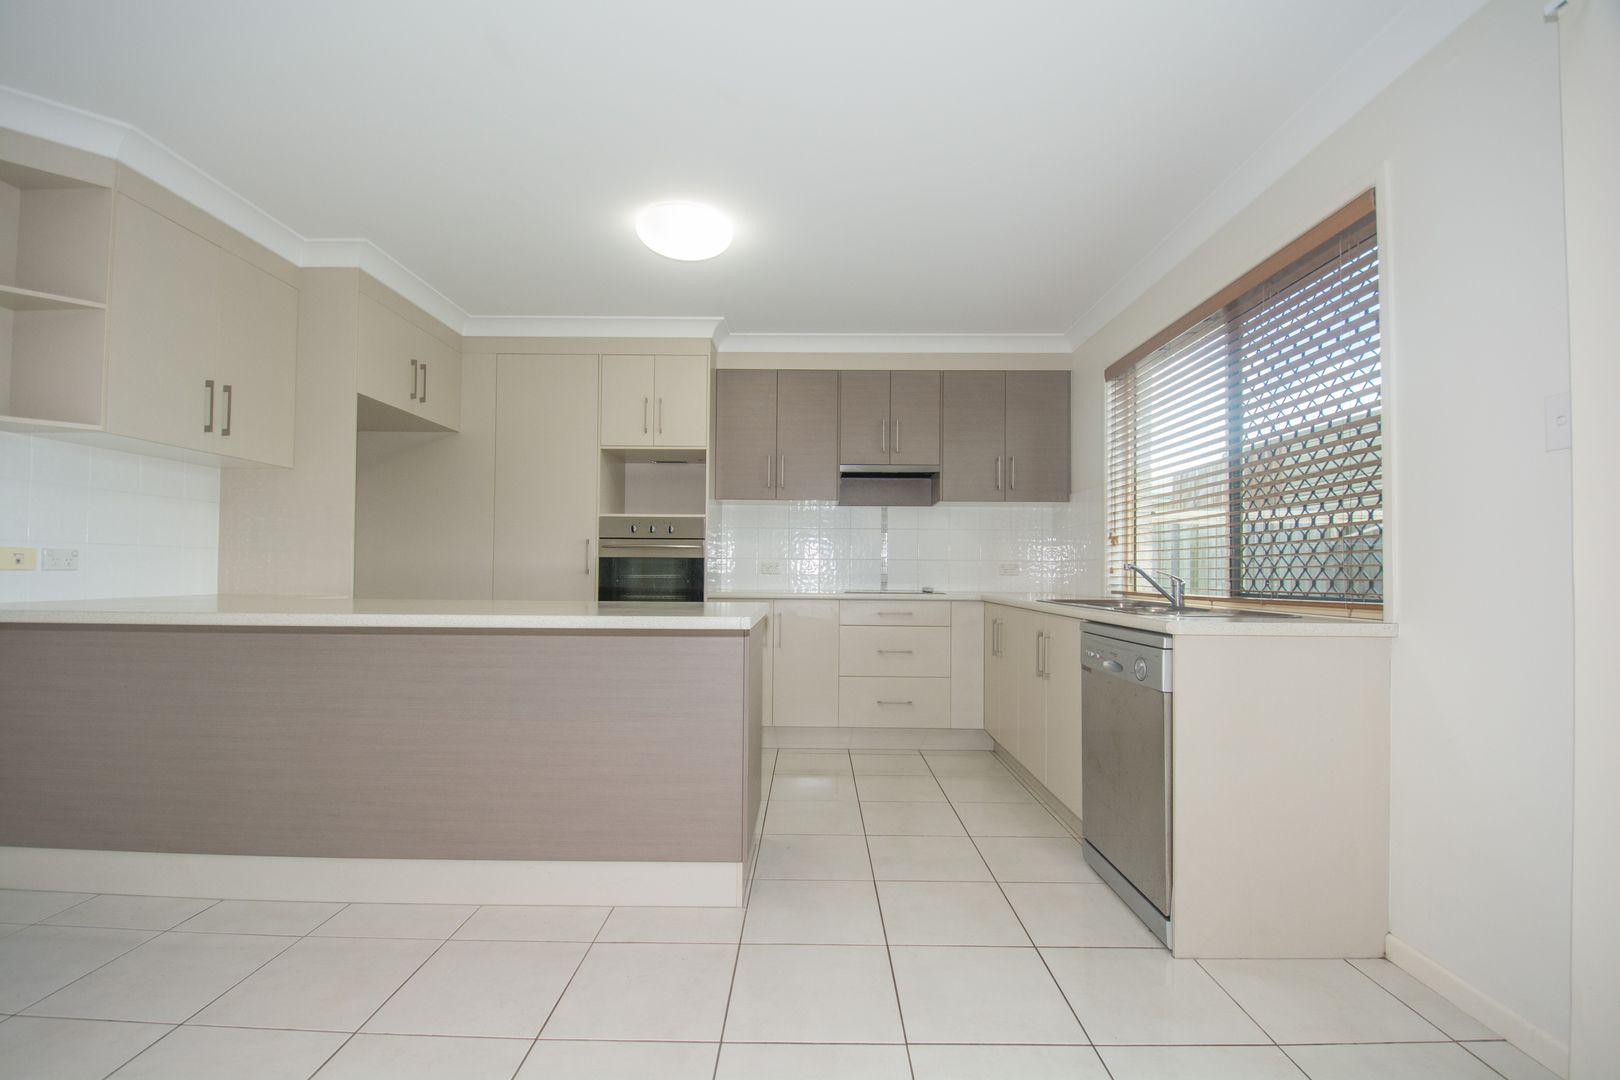 3/10 Curtis Street, Bundaberg South QLD 4670, Image 1